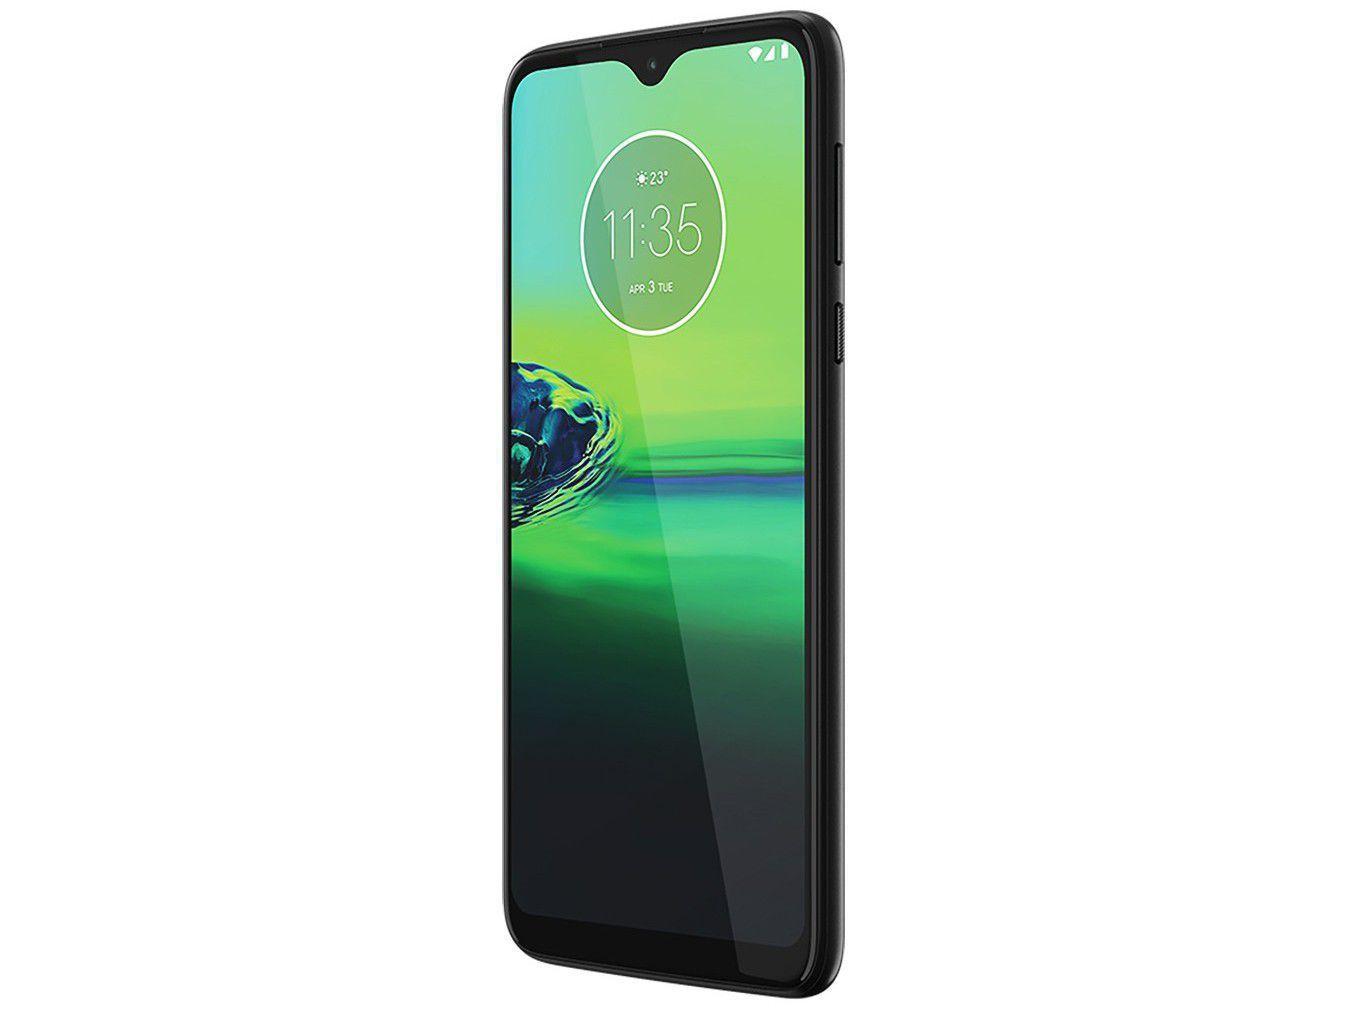 "Smartphone Motorola Moto G8 Play Preto Onix 32GB, Tela Max Vision de 6.2"" HD+, Câmera Traseira Tripla, Android 9.0 e Processador Octa-Core - 4"